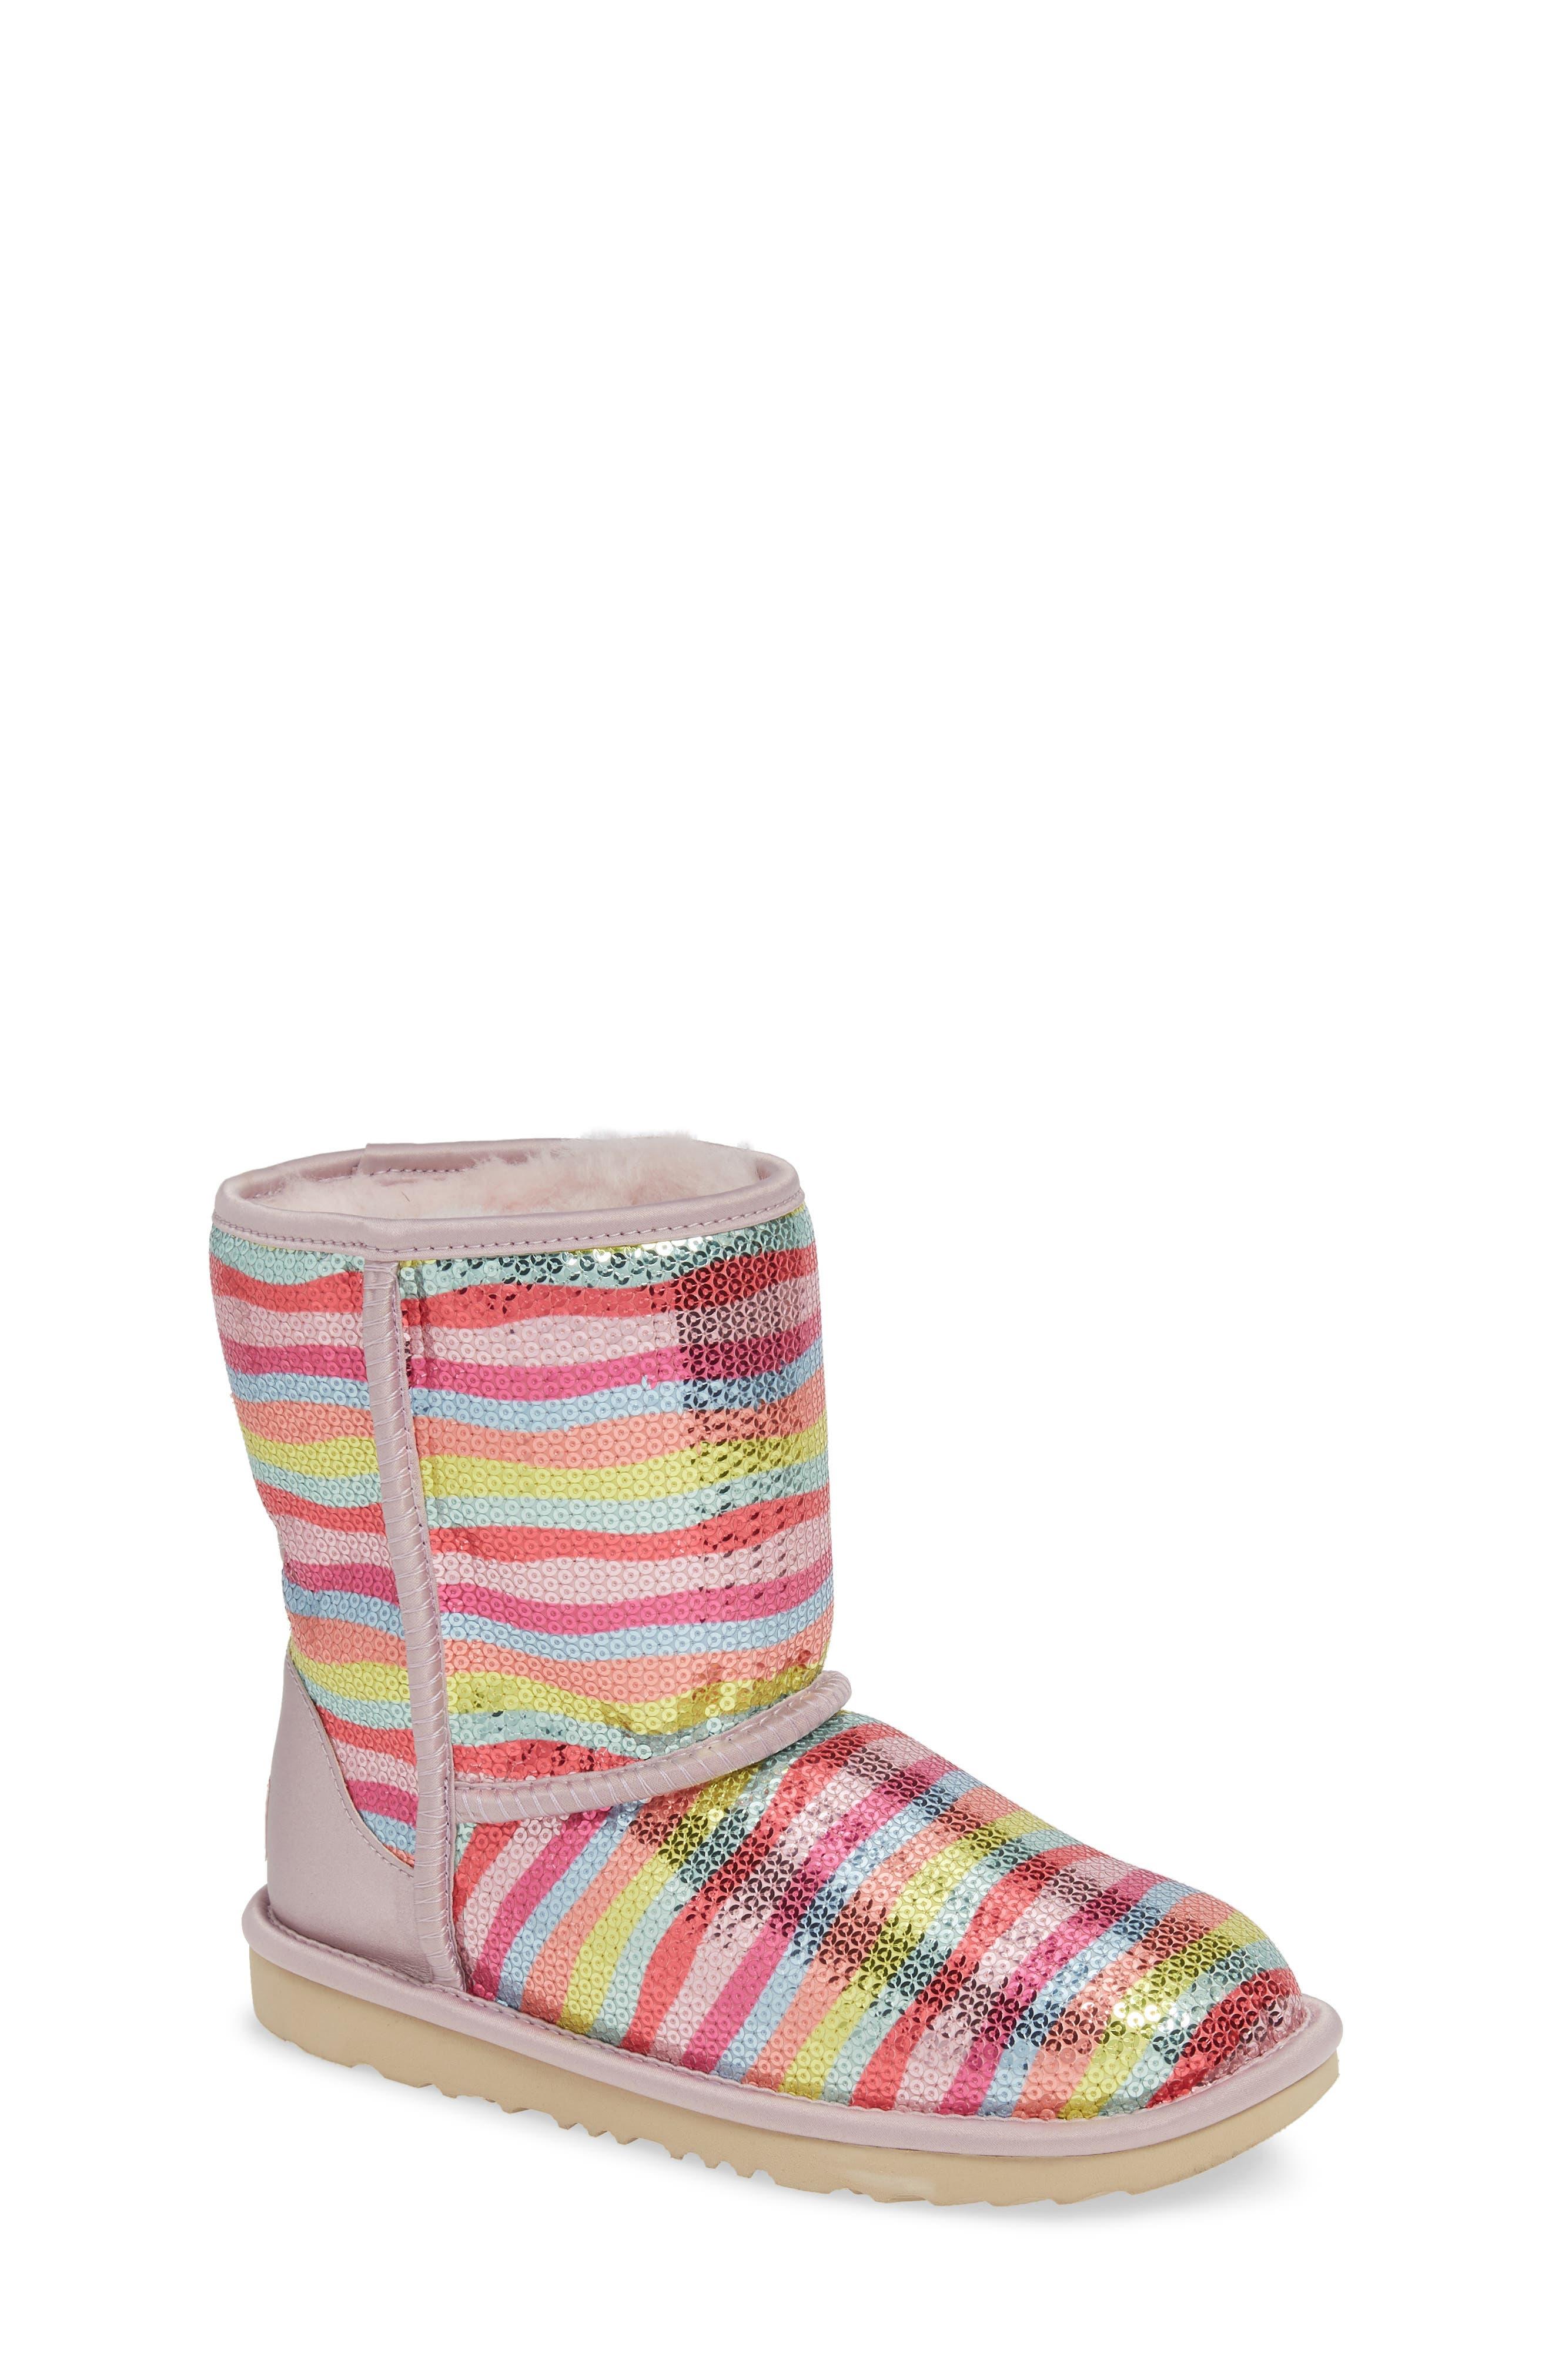 Rainbow Classic Short II Sequin Stripe Boot, Main, color, RAINBOW MULTI